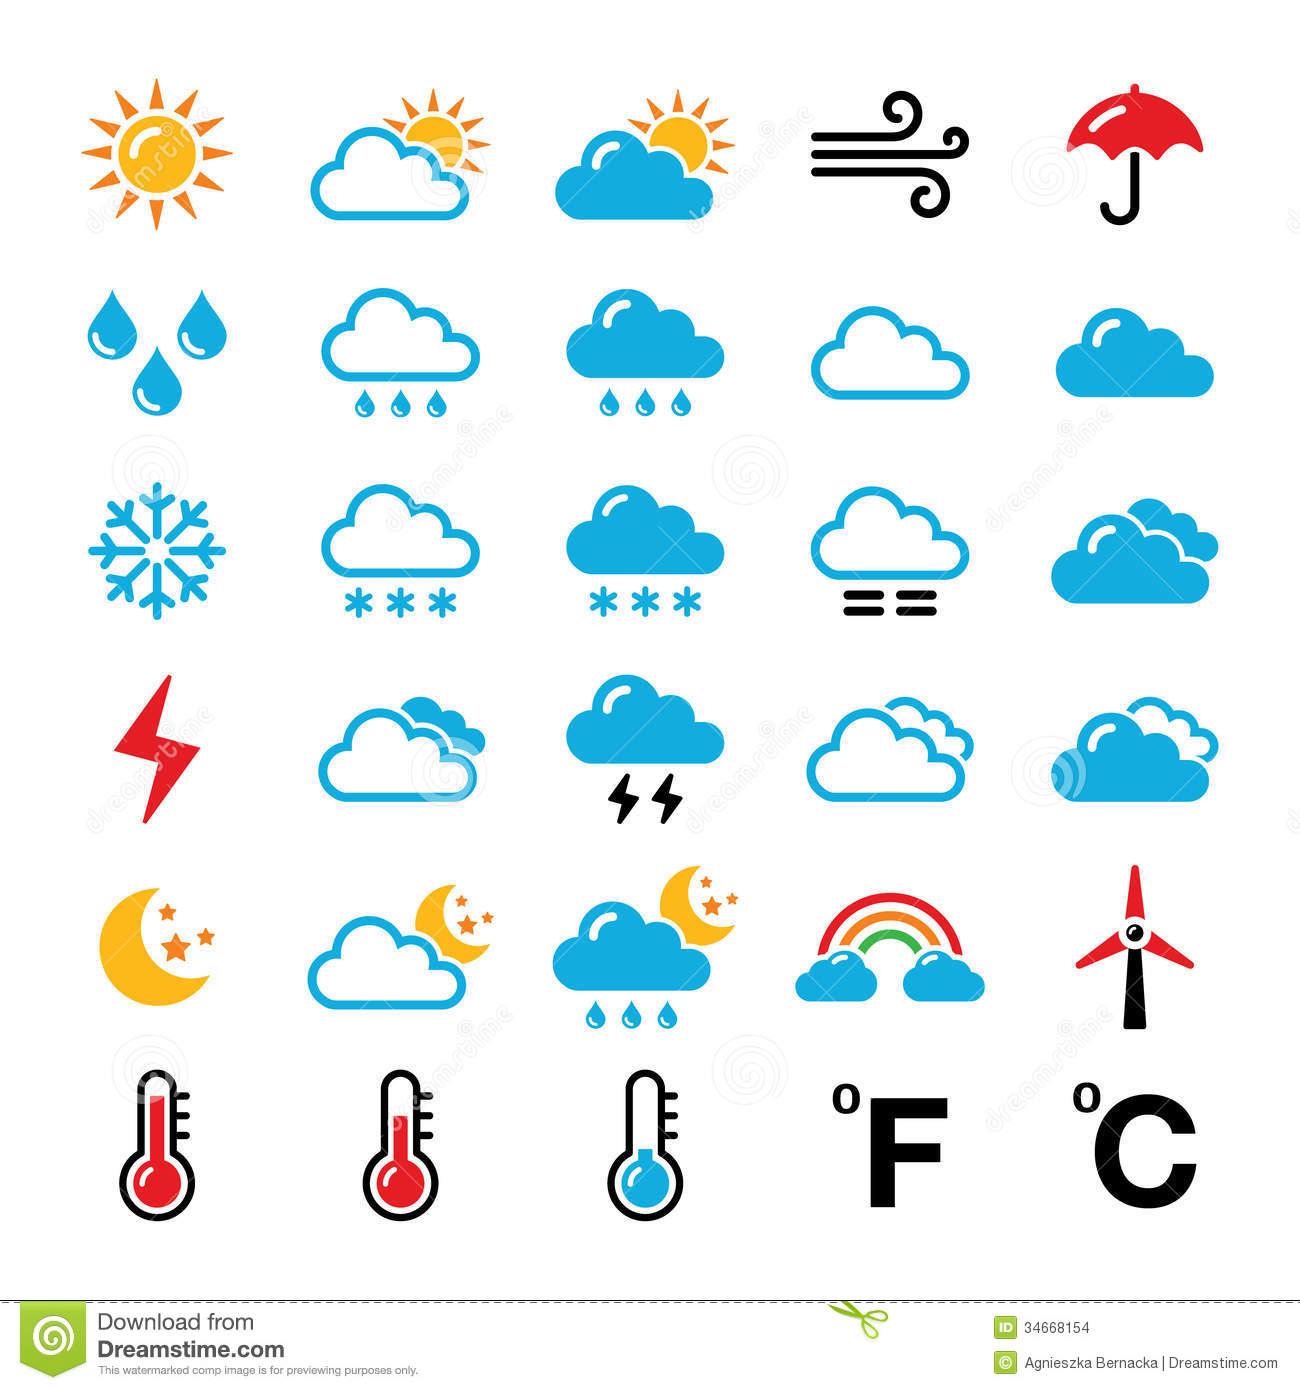 Worksheet On Weather Symbols